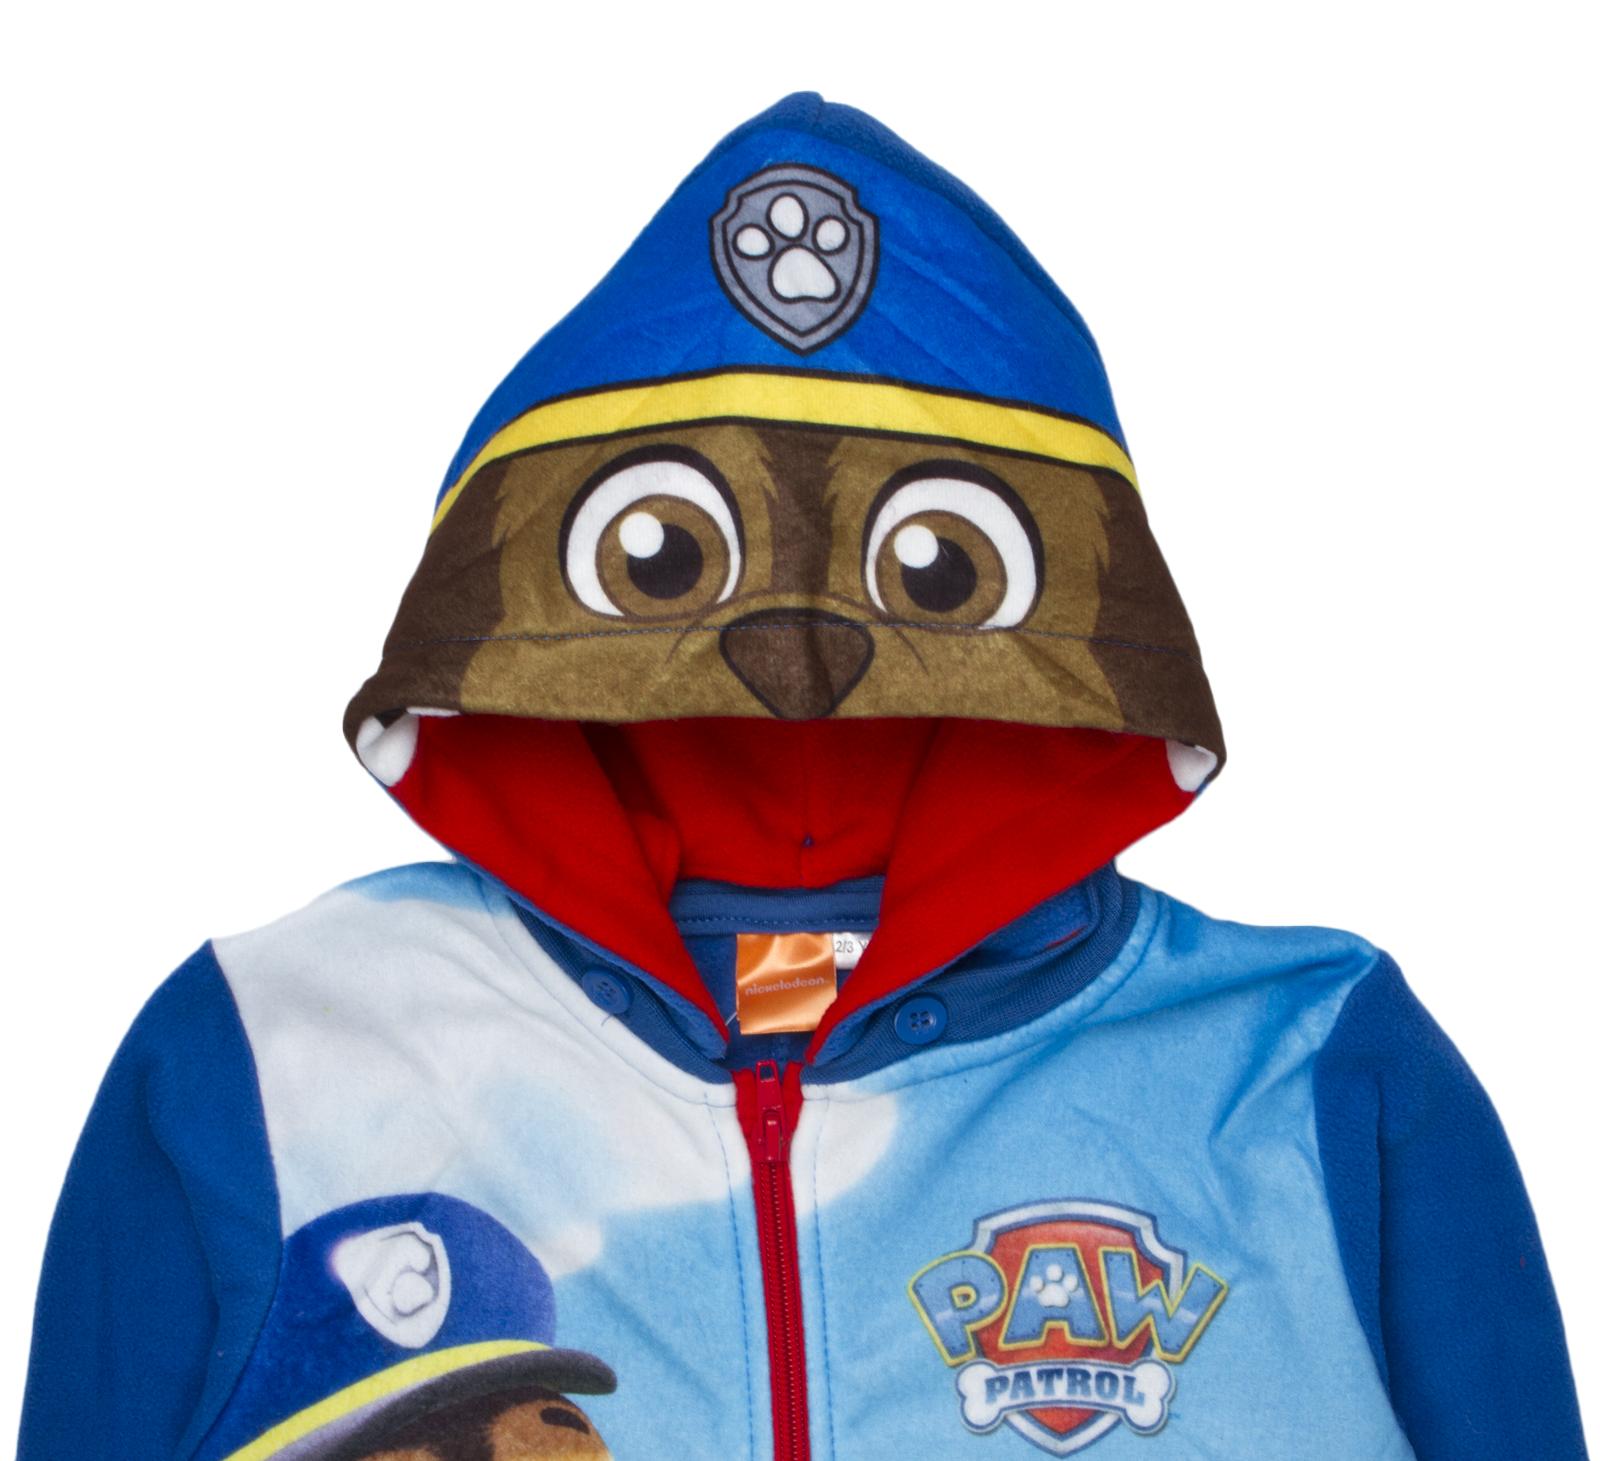 2b3c46c8367e Details about Paw Patrol Fleece Jumpsuit Reversible Hood Pyjamas All In One  Pjs Boys Girls